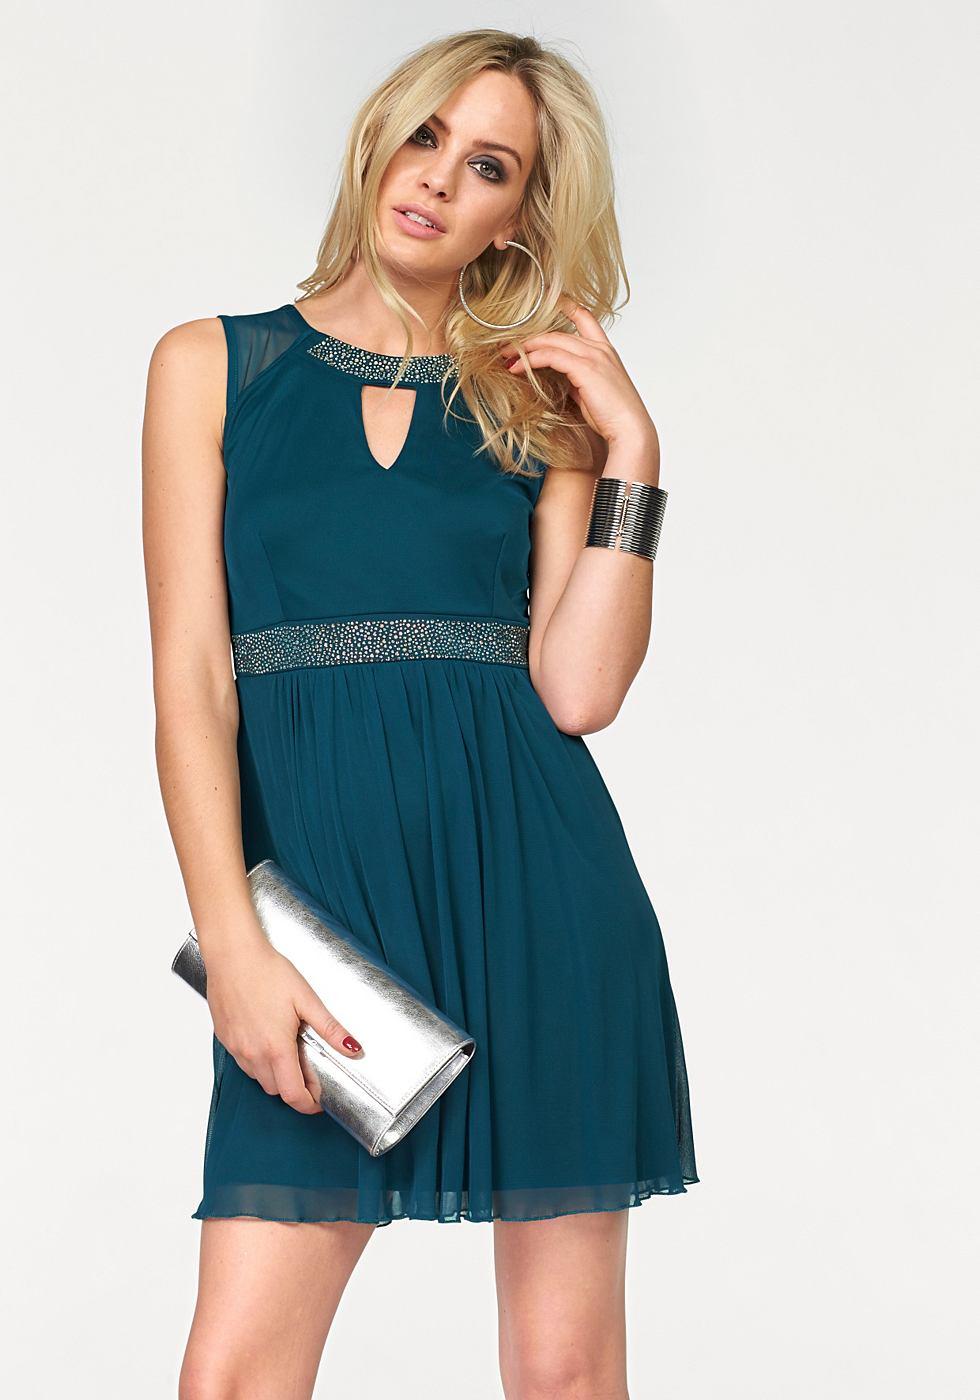 Melrose Party-jurk met strassteentjes blauw